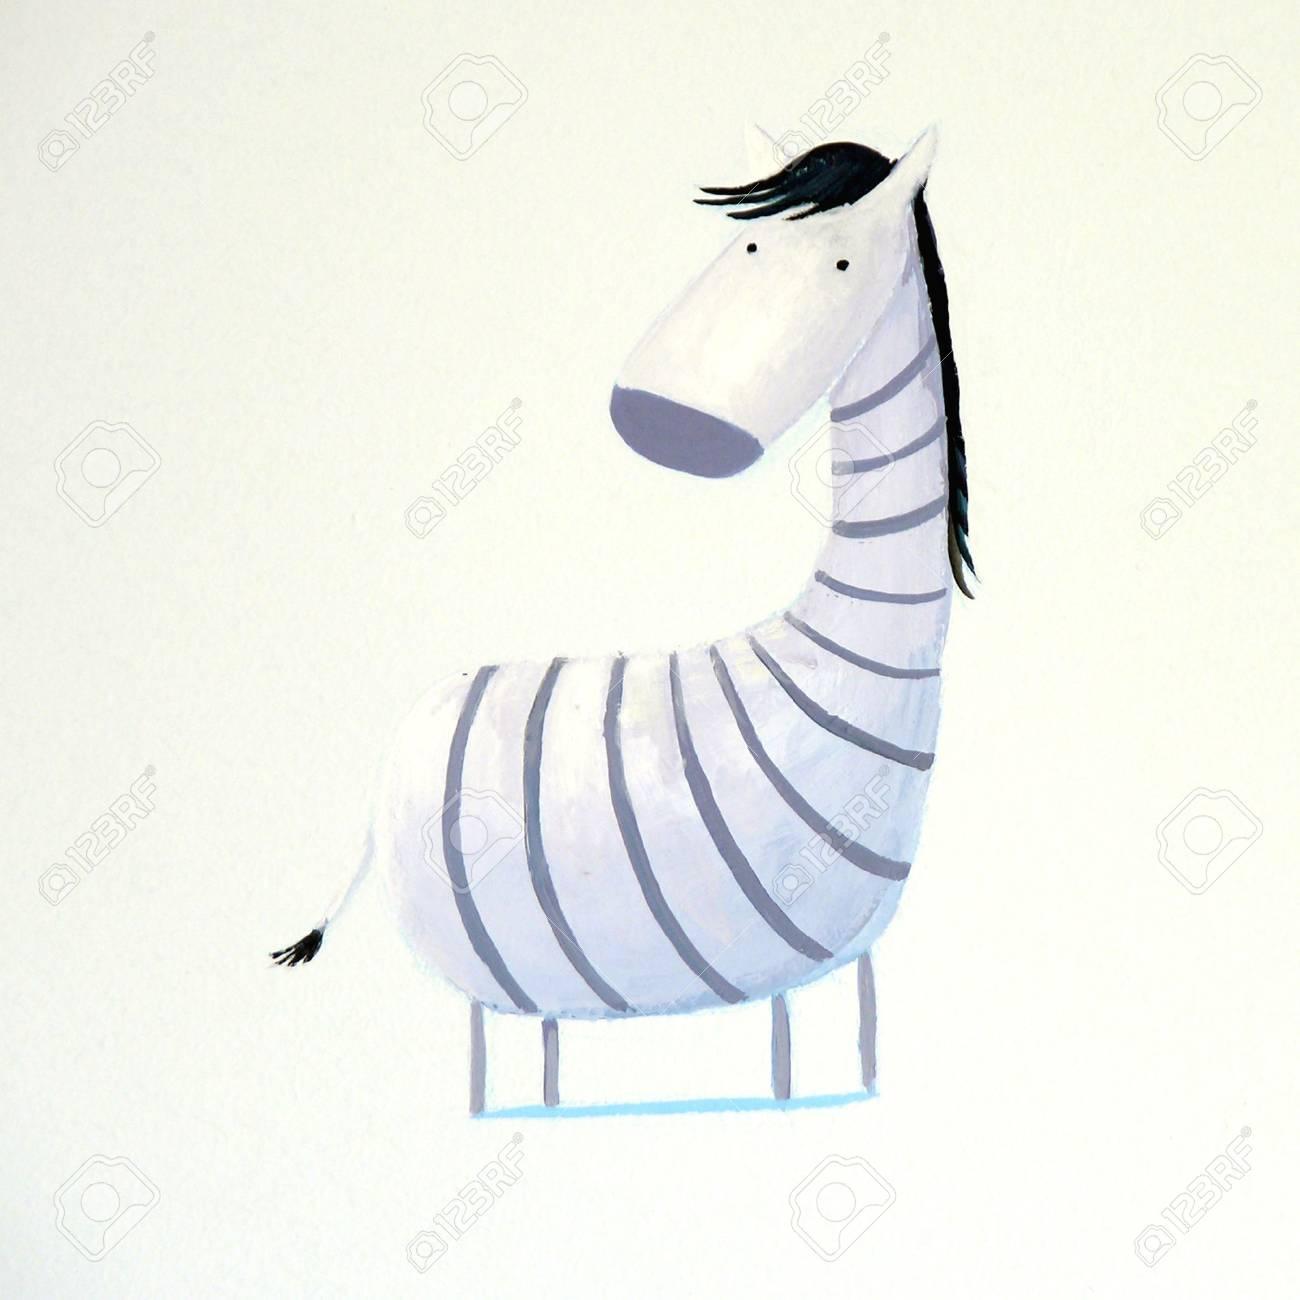 abstract baby zebra Stock Photo - 4815547